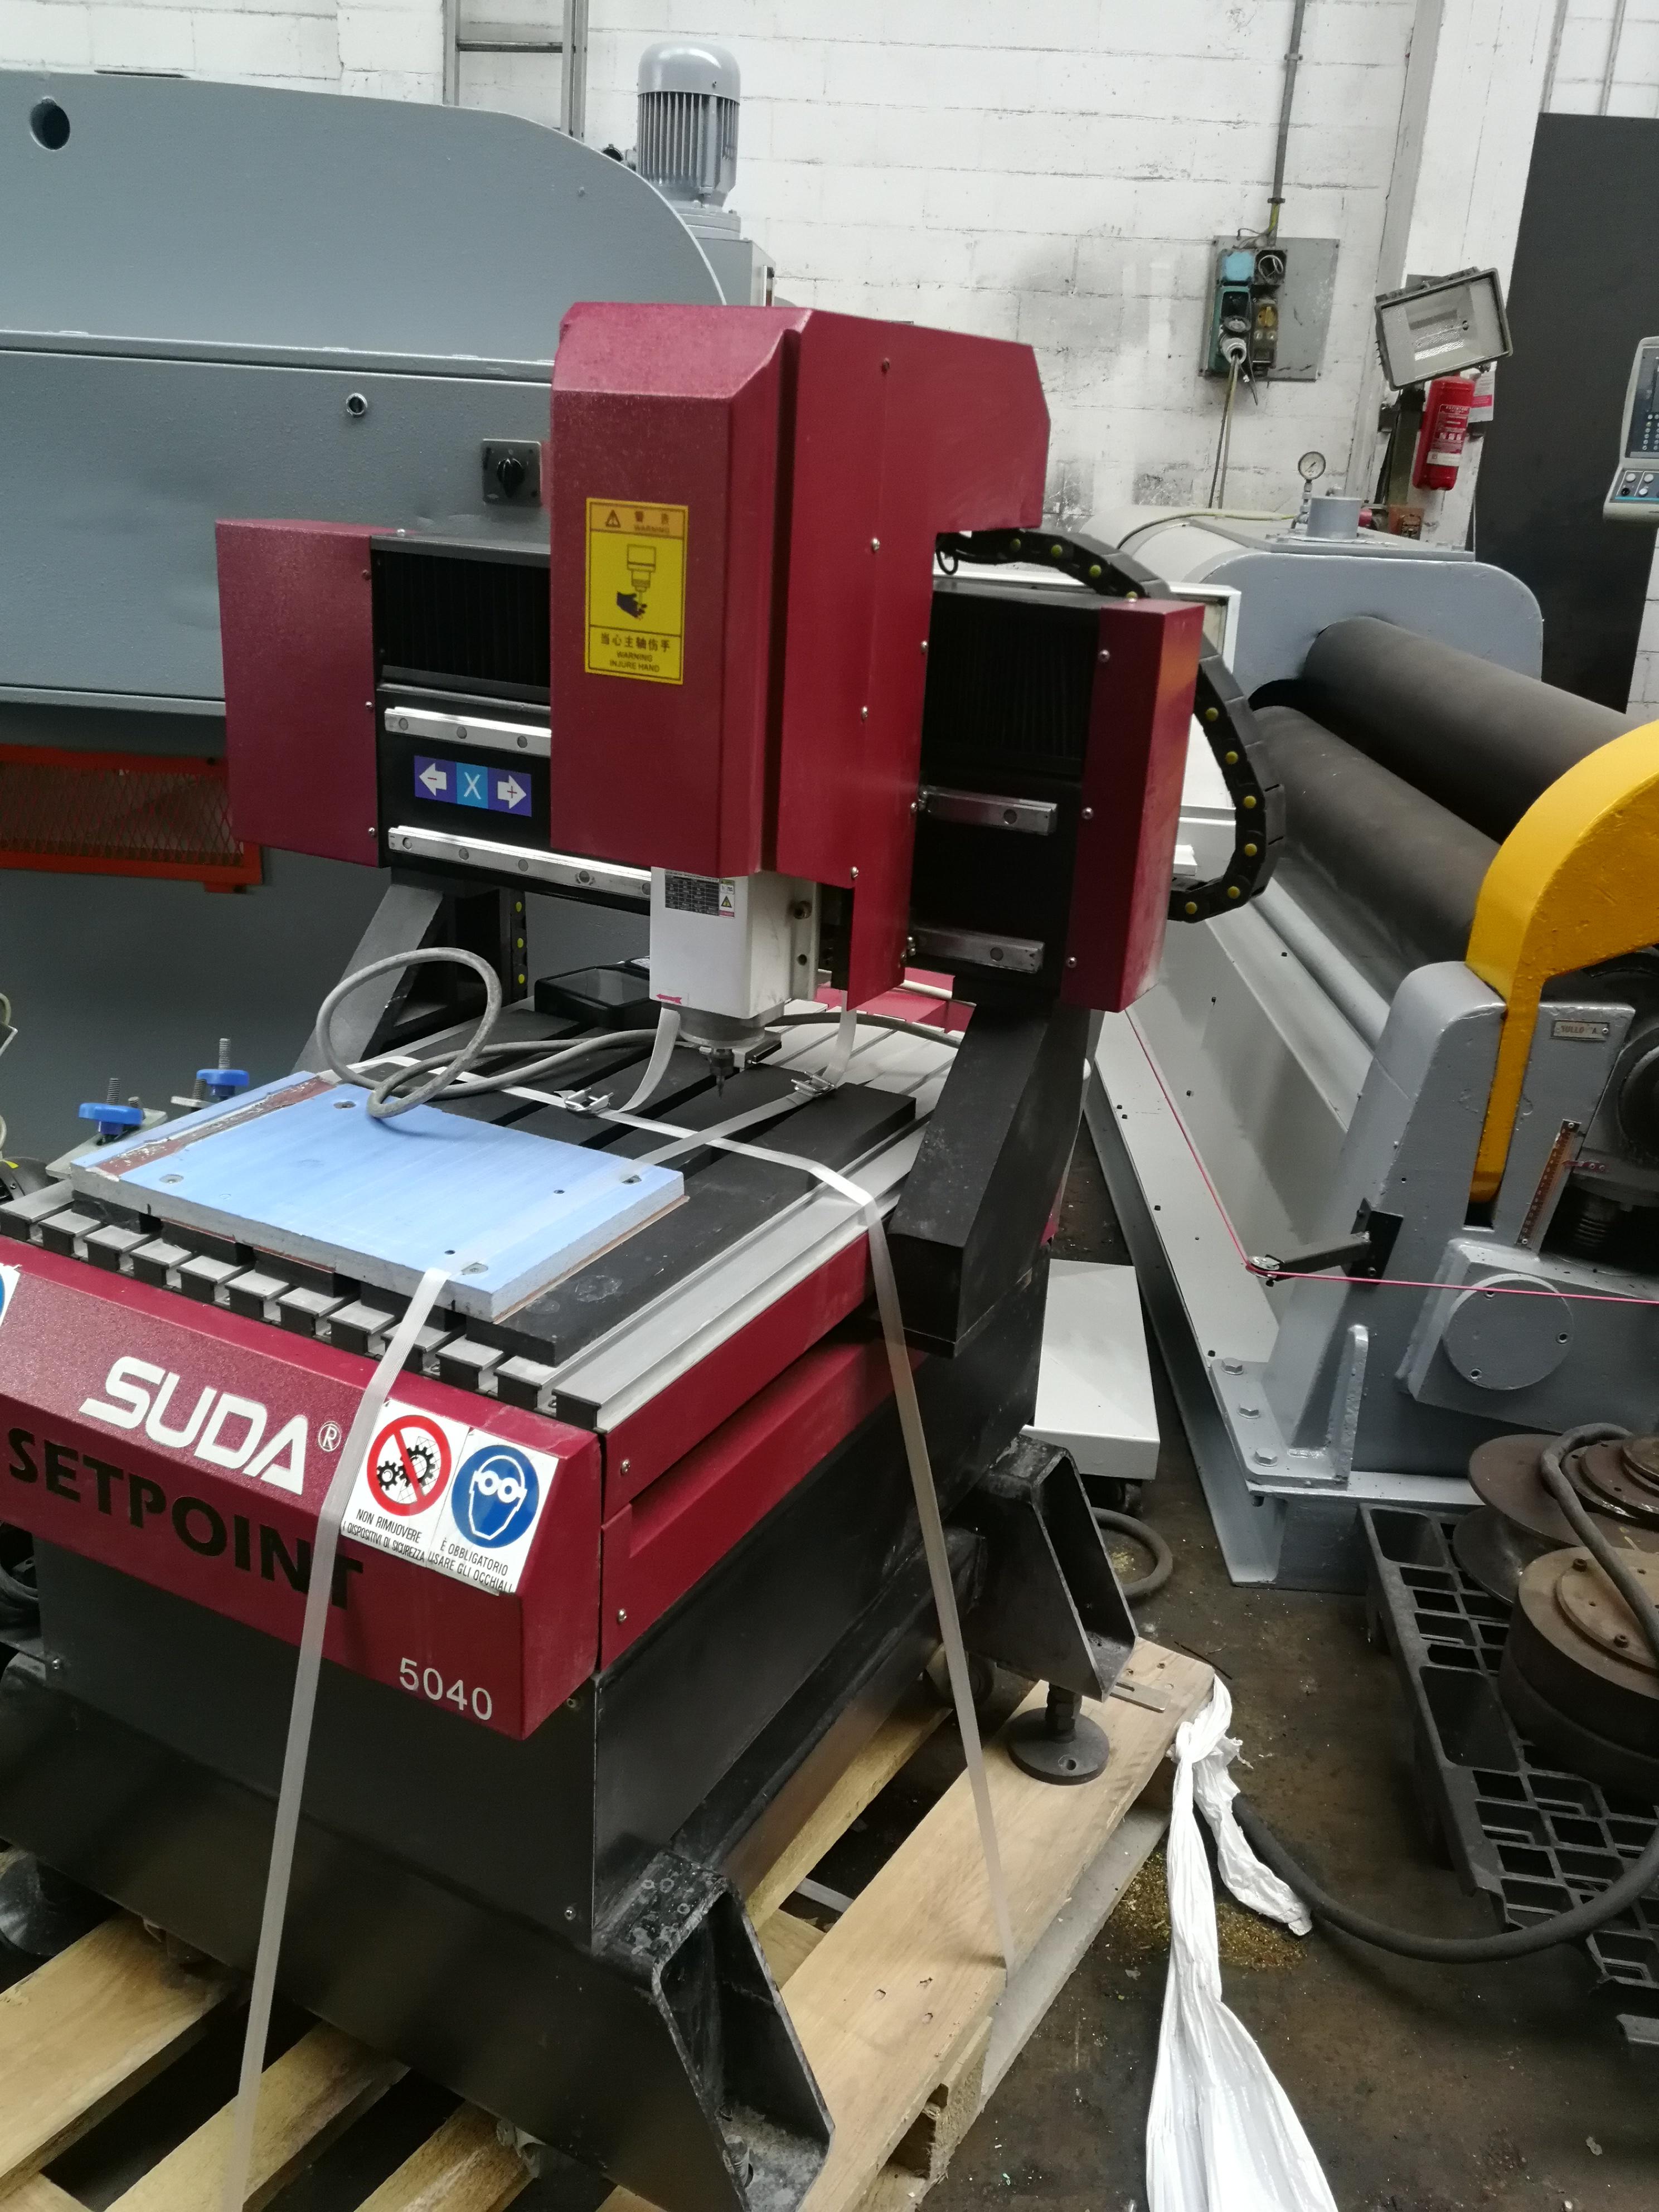 MICRO-FRESATRICE CNC SETPOINT SUDA 5040 in vendita - foto 2